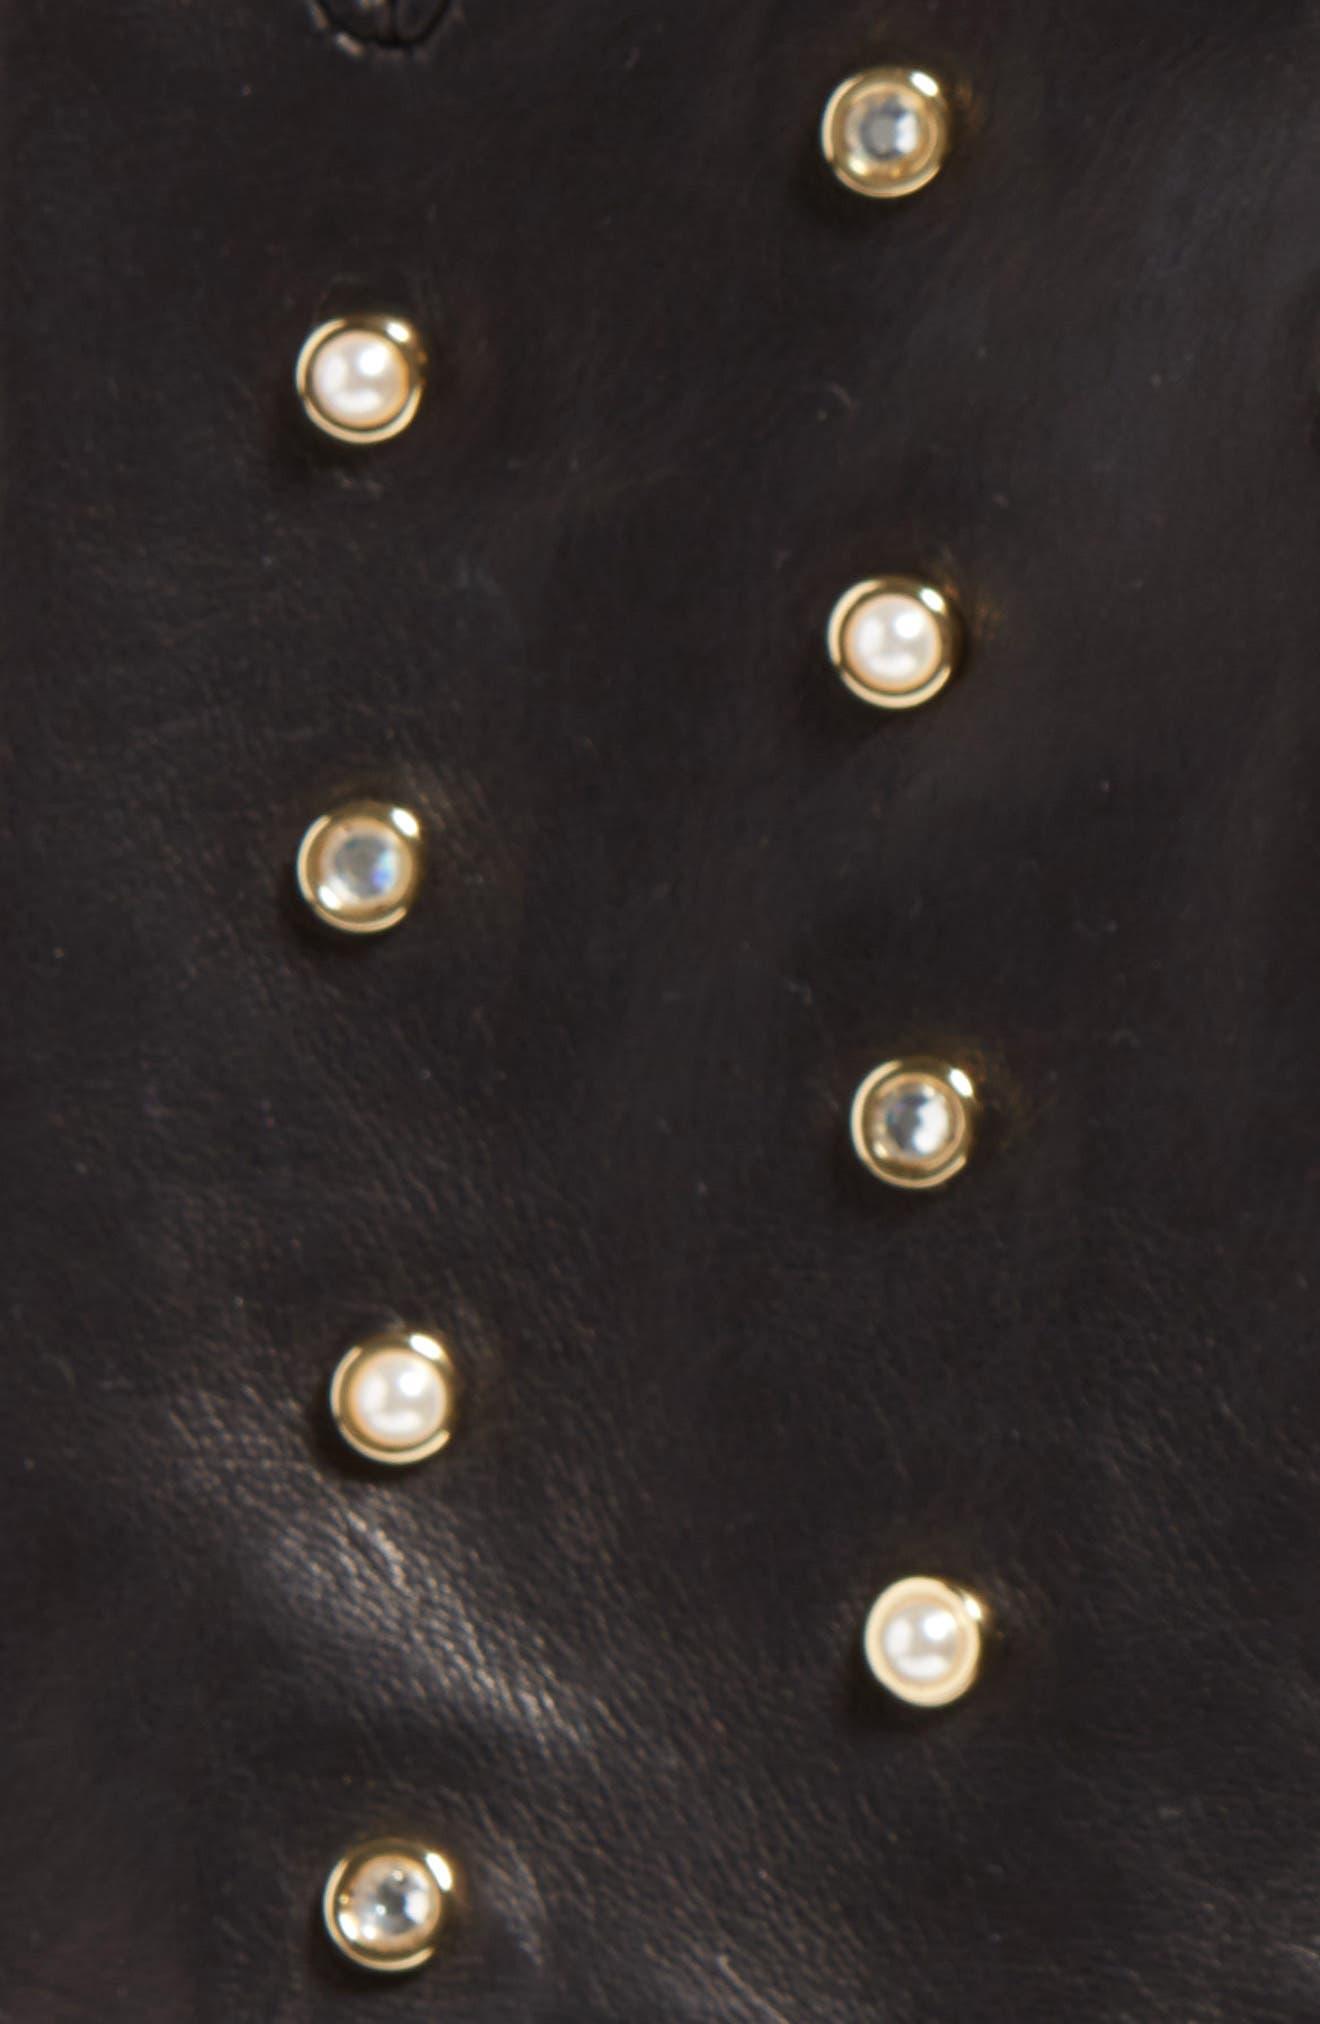 Alternate Image 2  - Ted Baker London Imitation Pearl & Crystal Scattered Leather Gloves